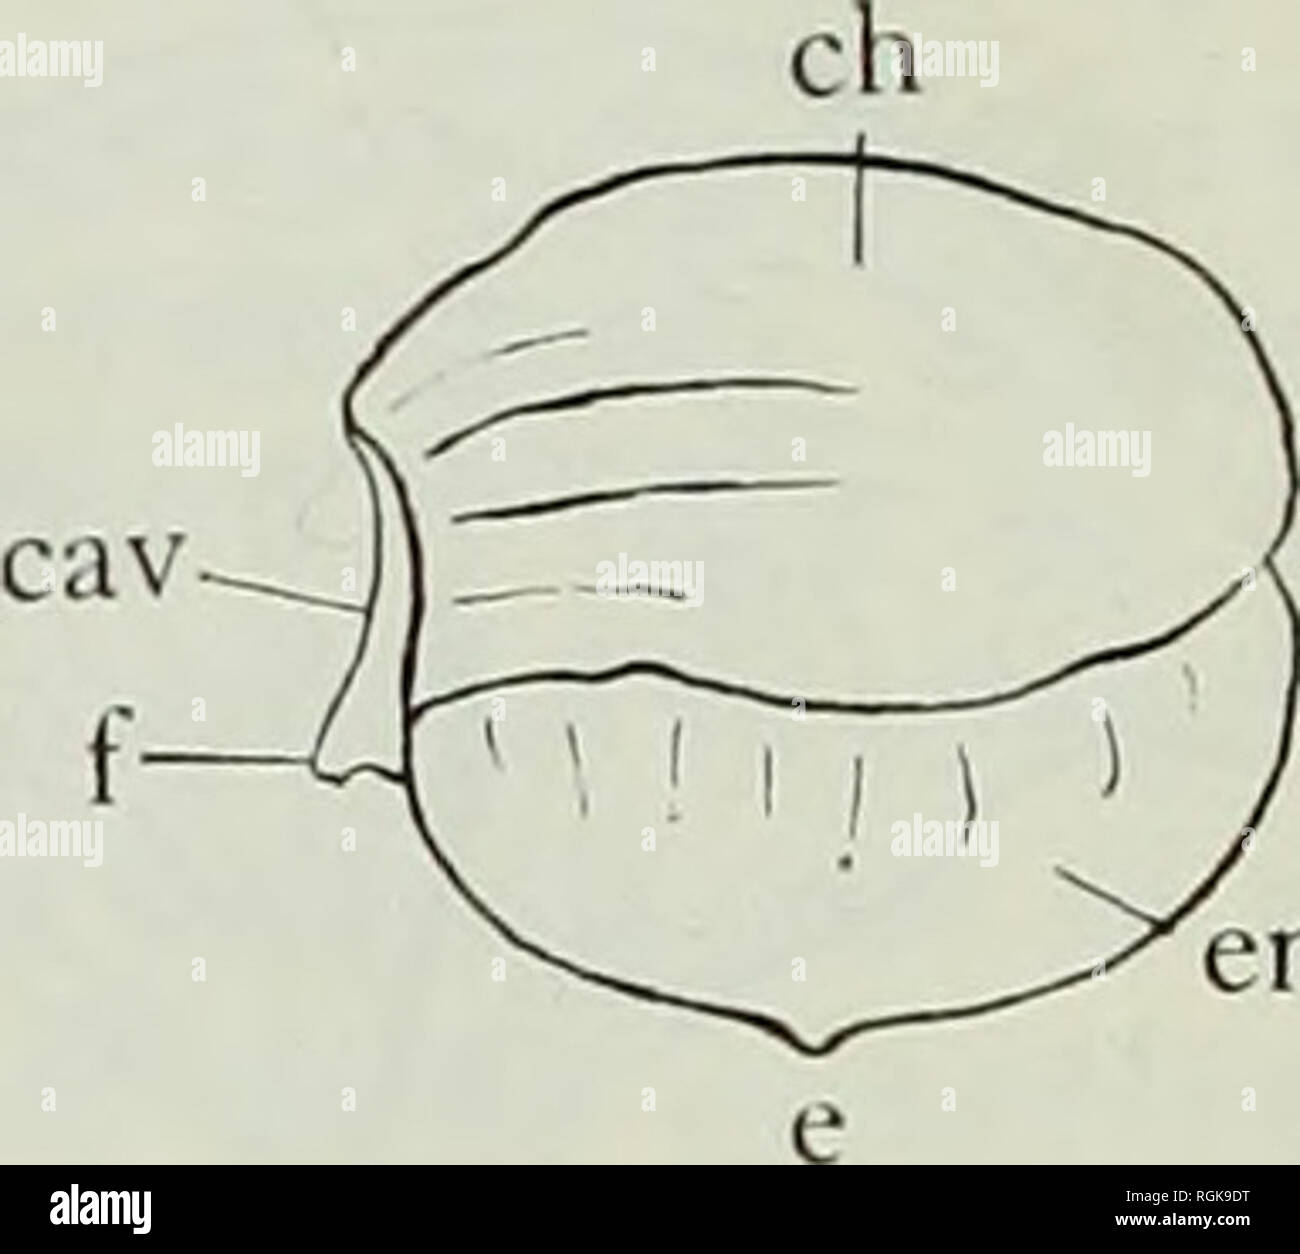 hight resolution of bivalve cast diagram electrical engineering wiring diagram bivalve cast diagram